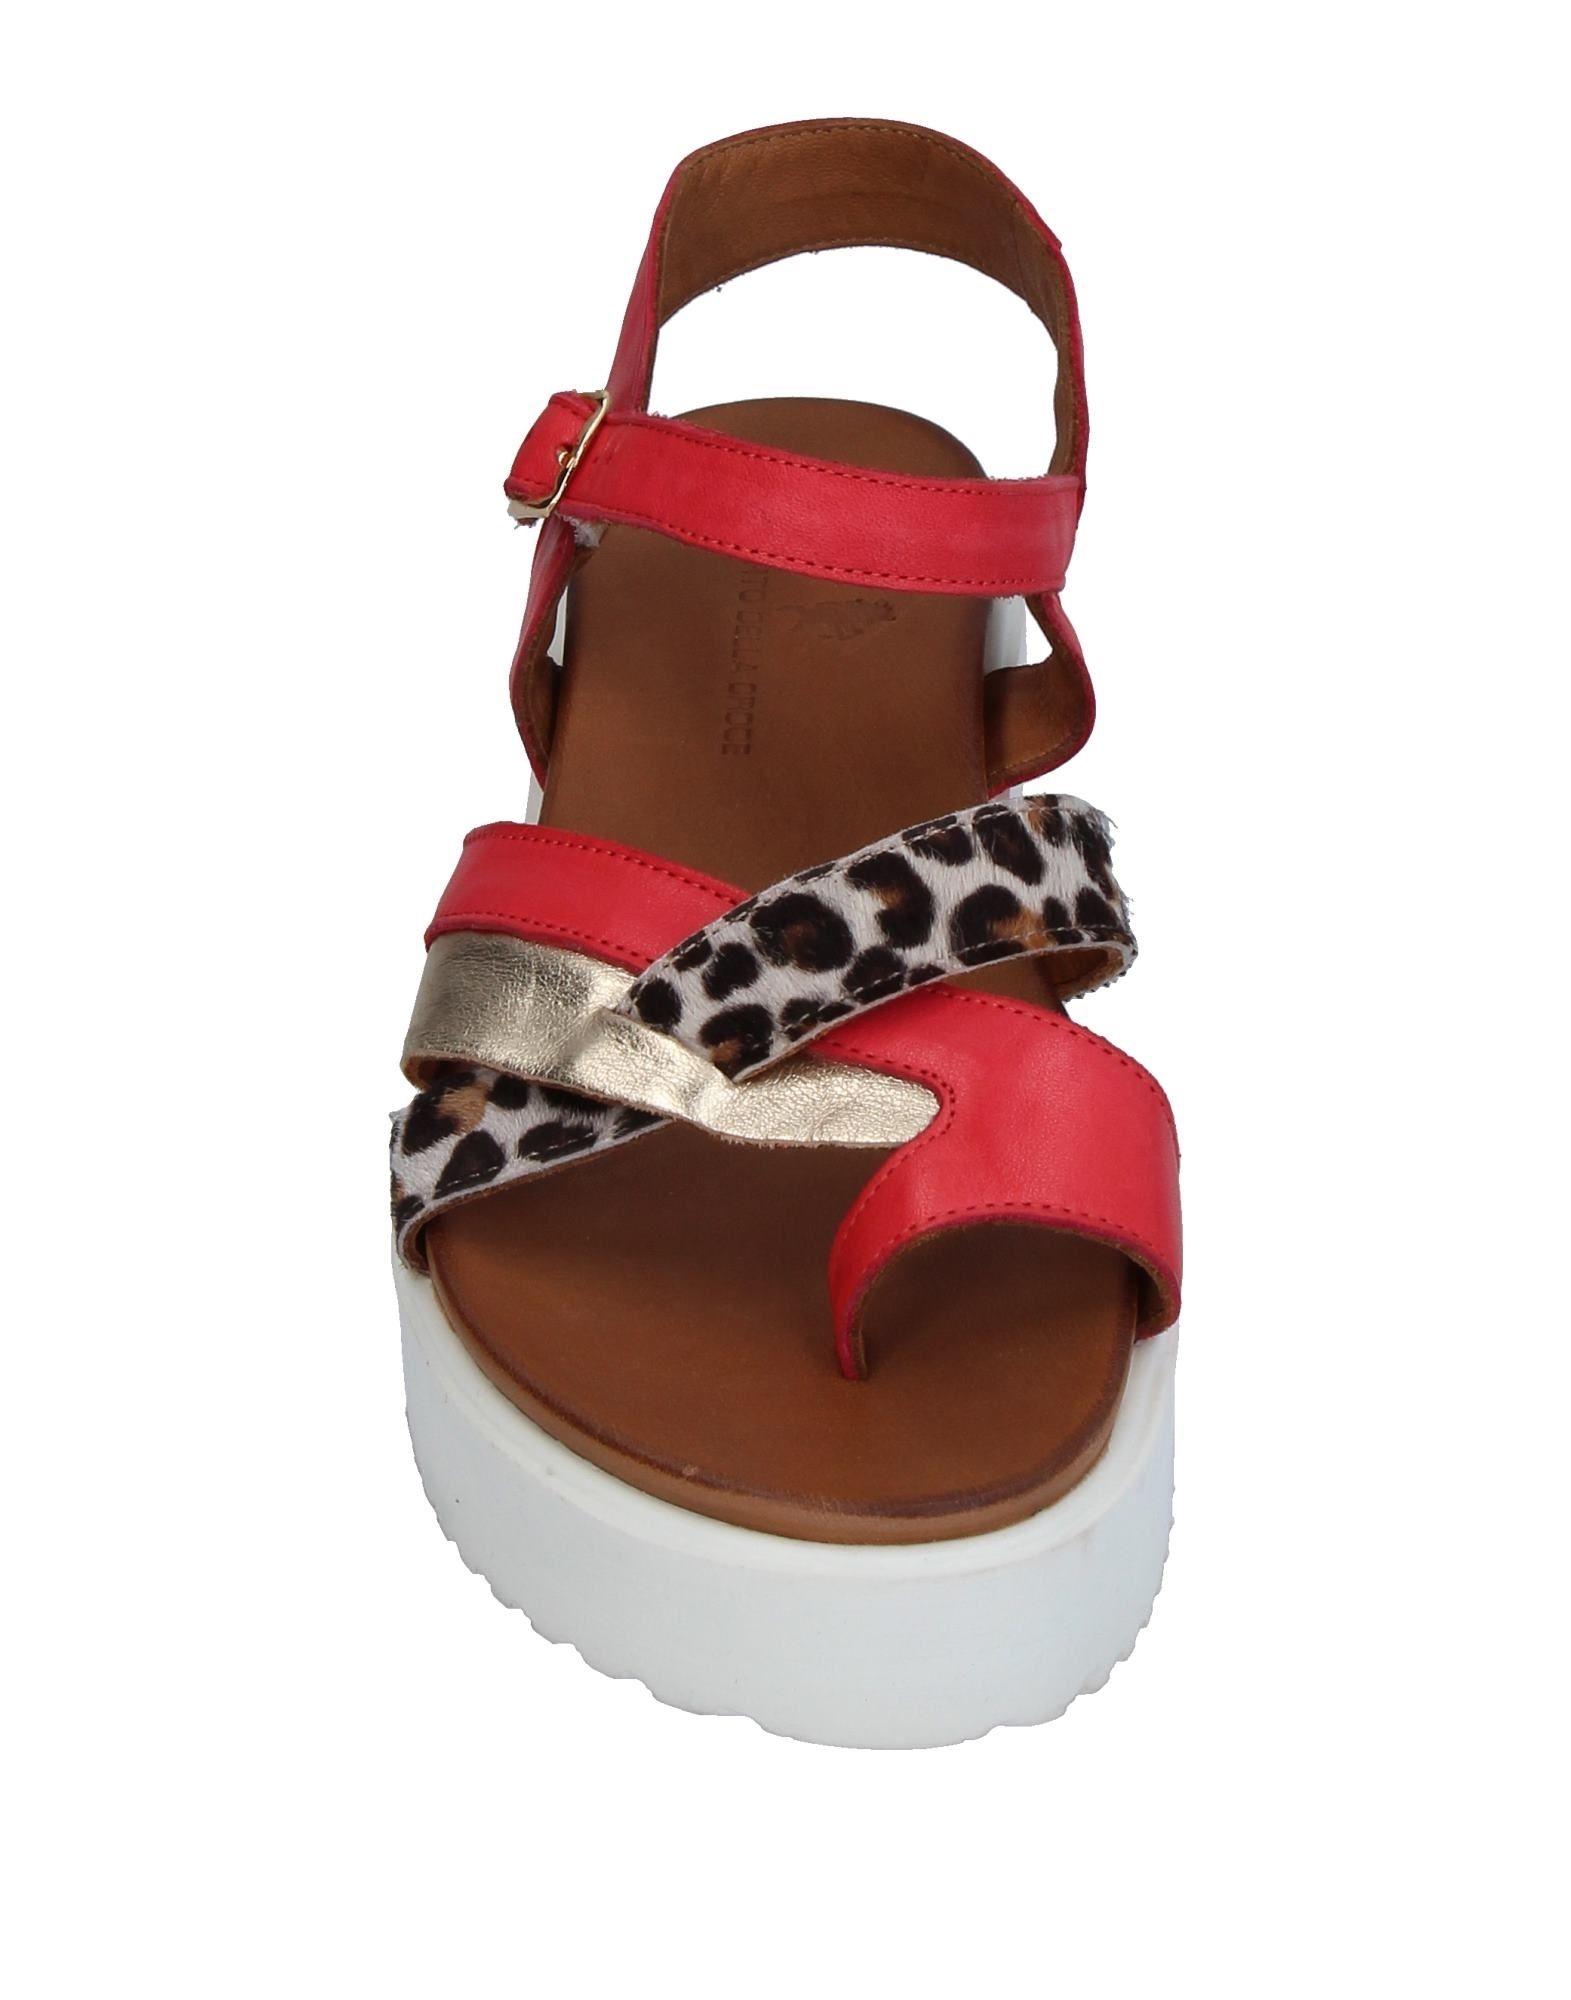 Roberto Della Croce Sandalen Sandalen Sandalen Damen  11411331AV Neue Schuhe 1b5208